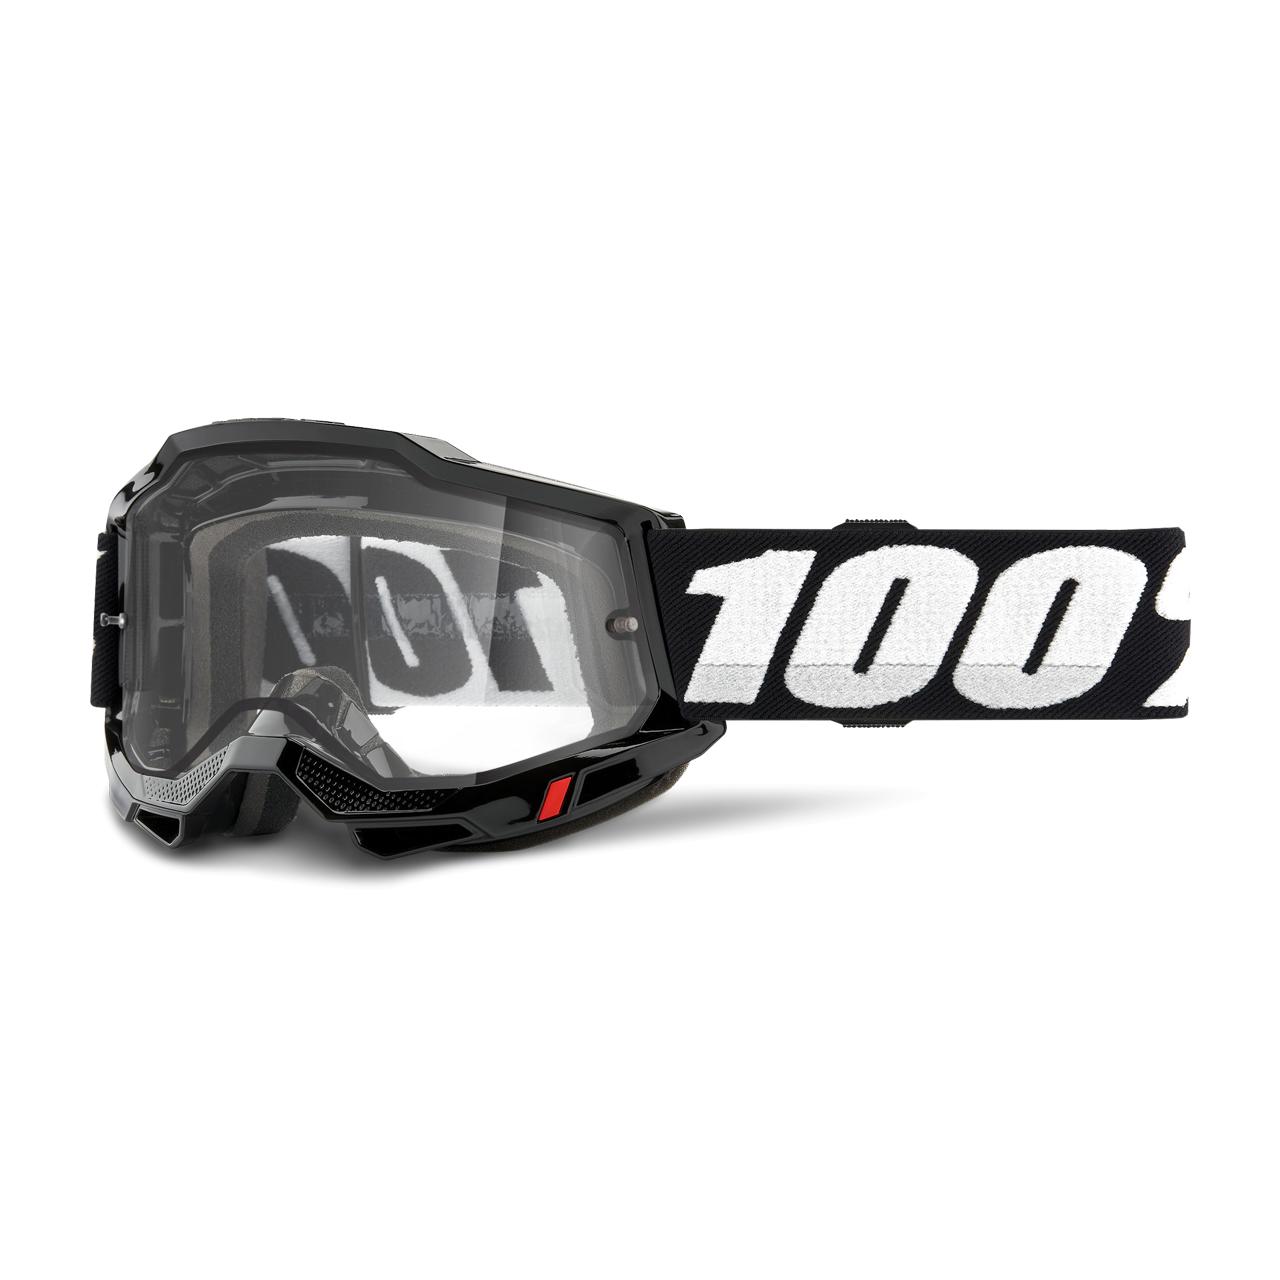 100% Maschera Cross  Accuri 2 Enduro Moto Nera